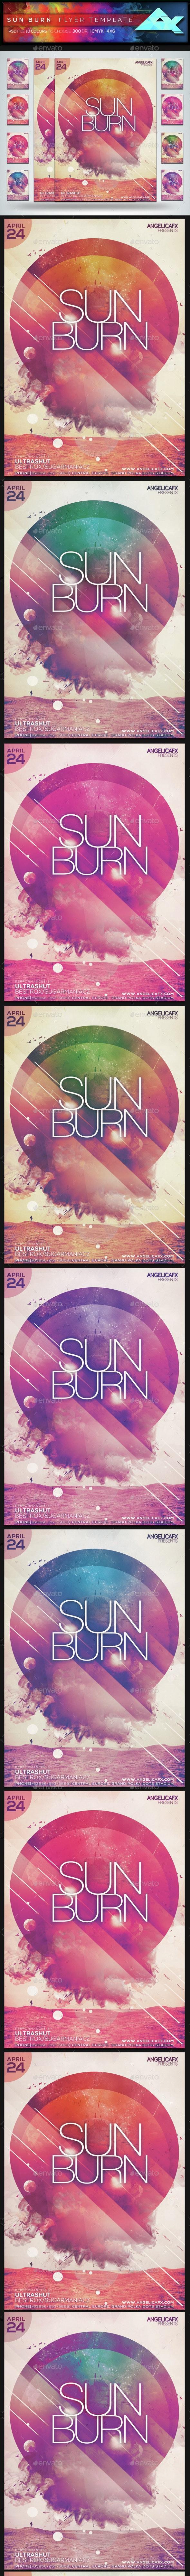 Sun Burn Flyer Template - Flyers Print Templates